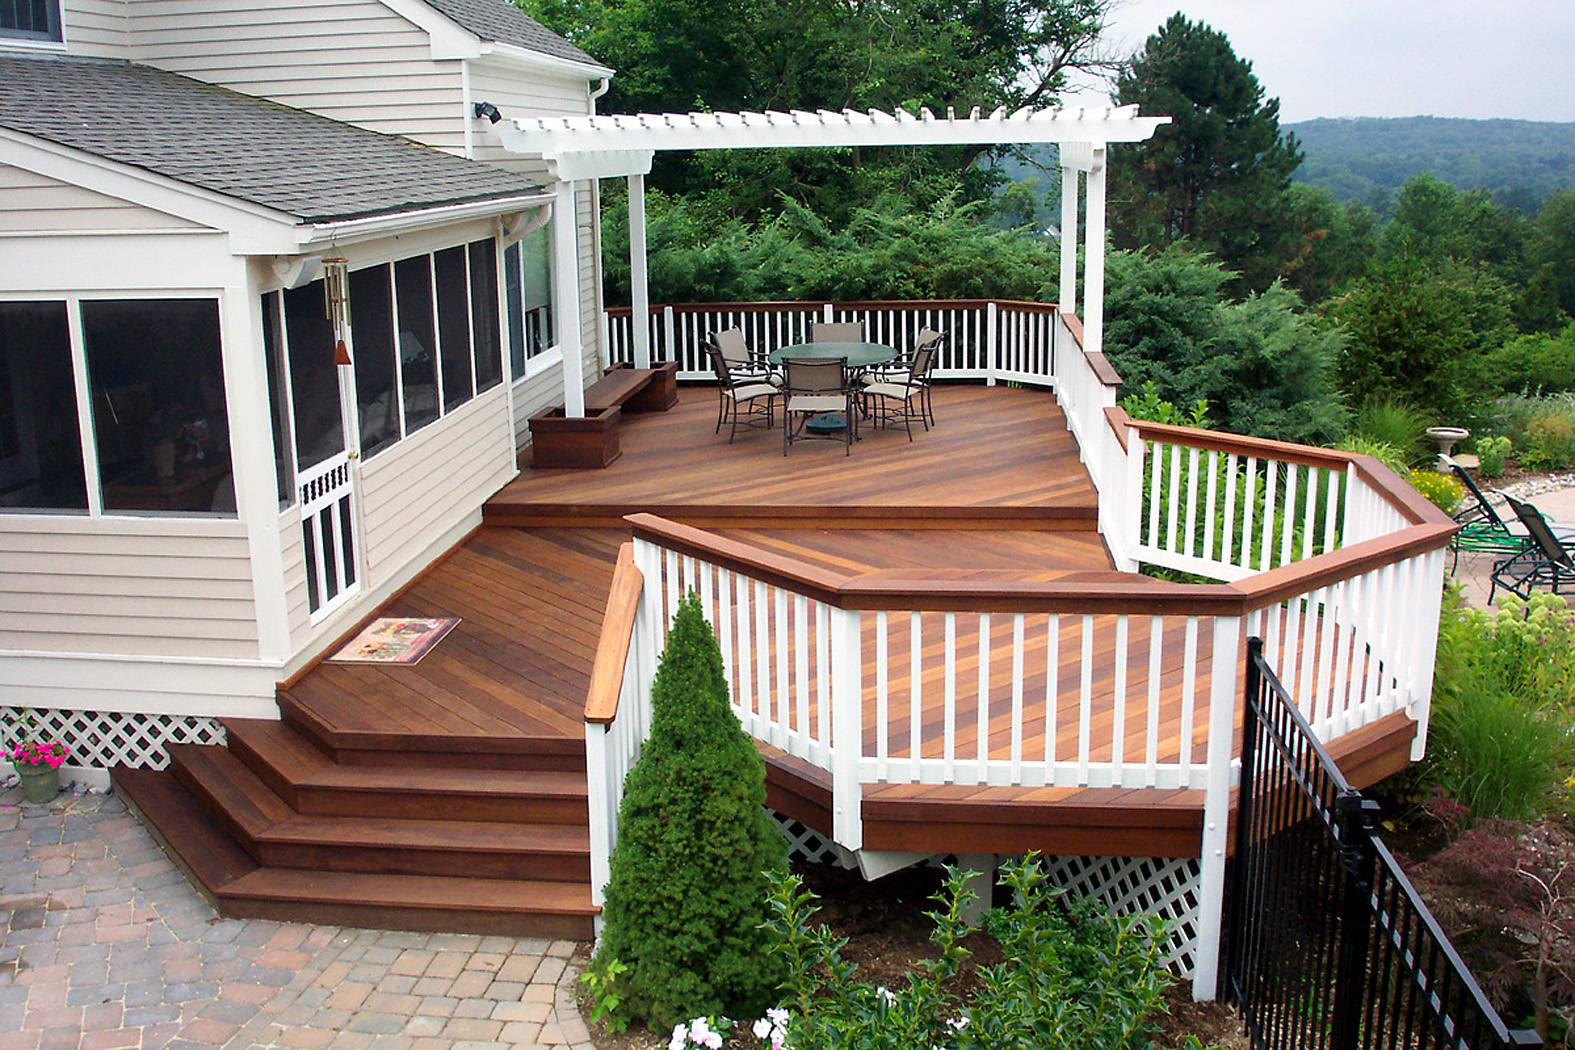 Ideas backyard deck designs : cozy backyard deck designs - h.